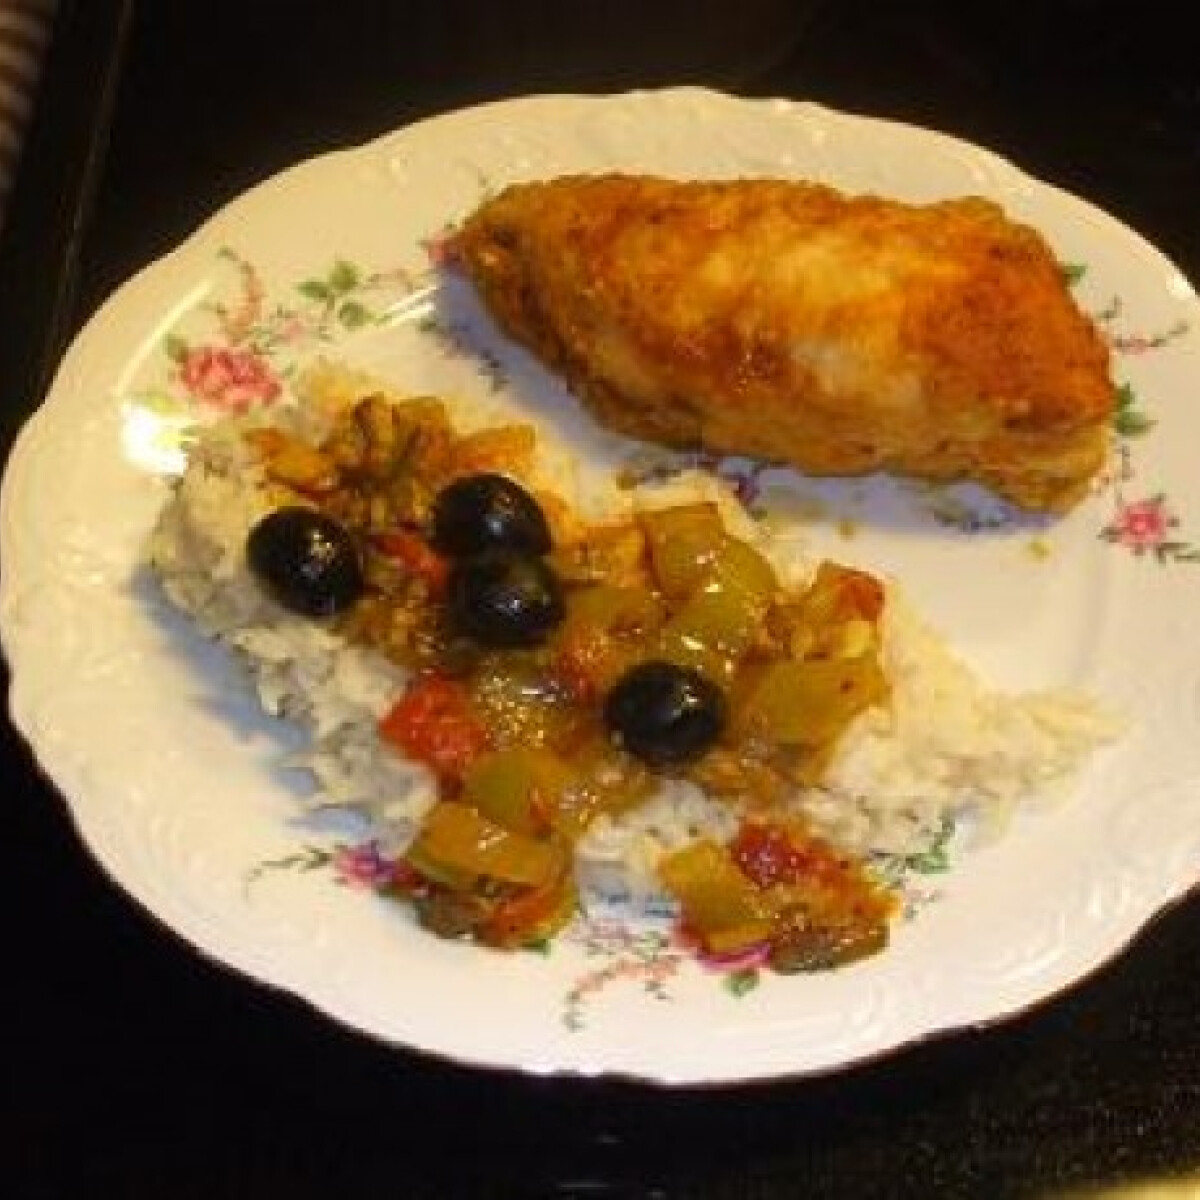 Csirke olaszosan avagy chicken cacciatore